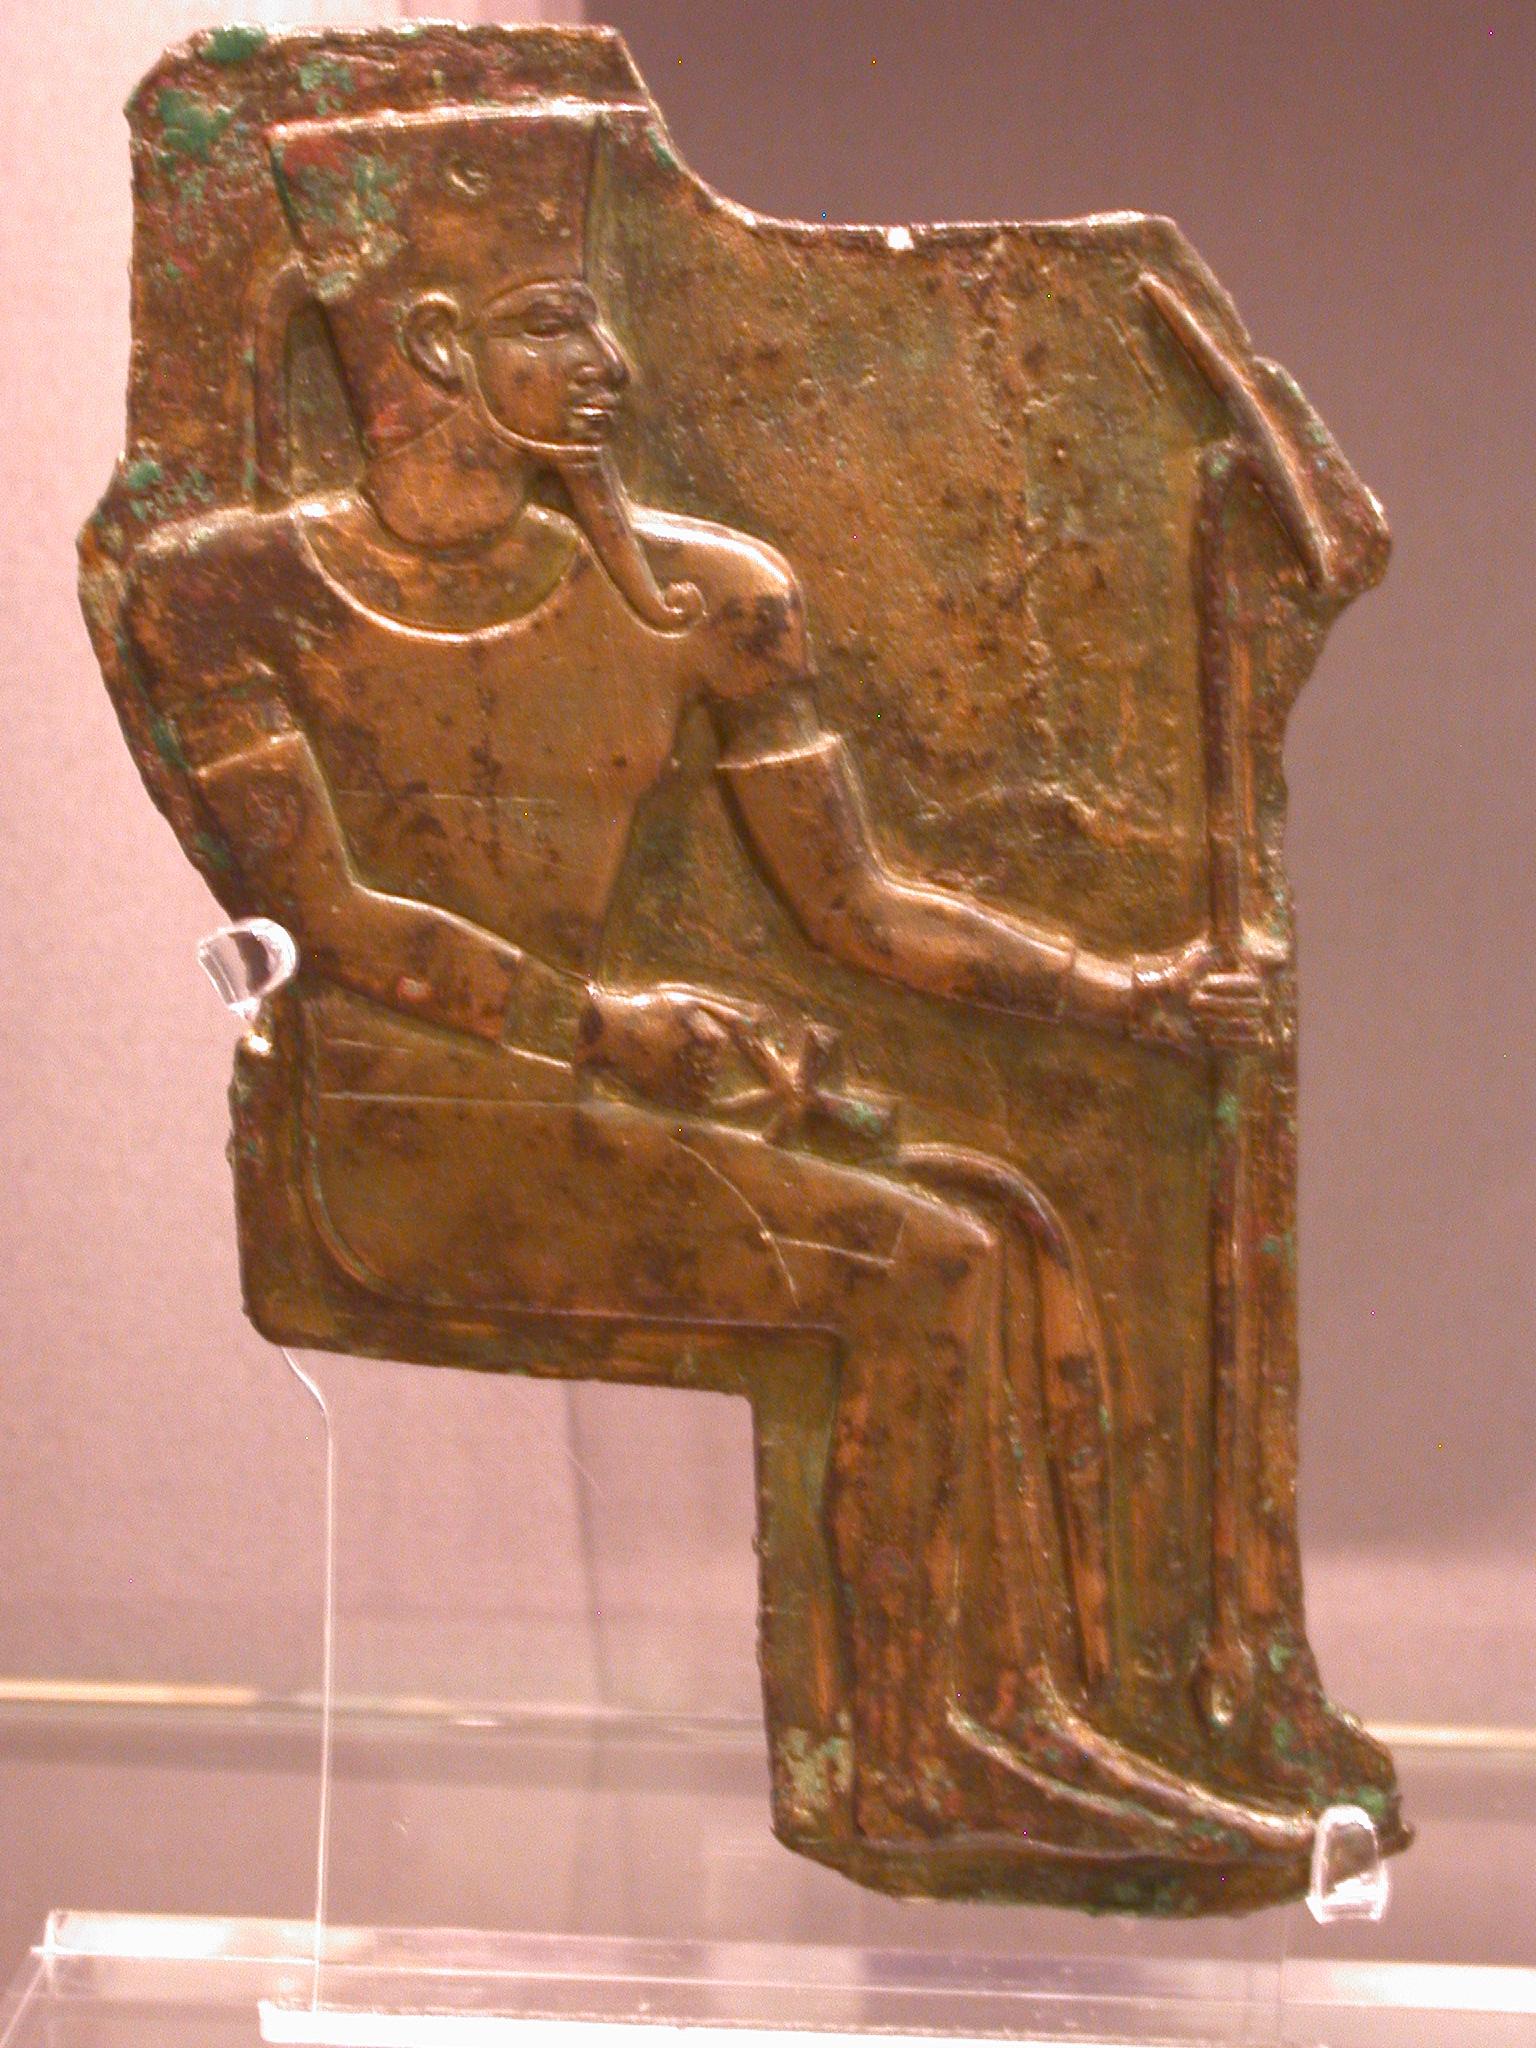 Amun Relief, Originally Inlaid, Copper Alloy, 25th Dynasty, 746-664 BCE, Saqqara, Egypt, in Fitzwilliam Museum, Cambridge, England